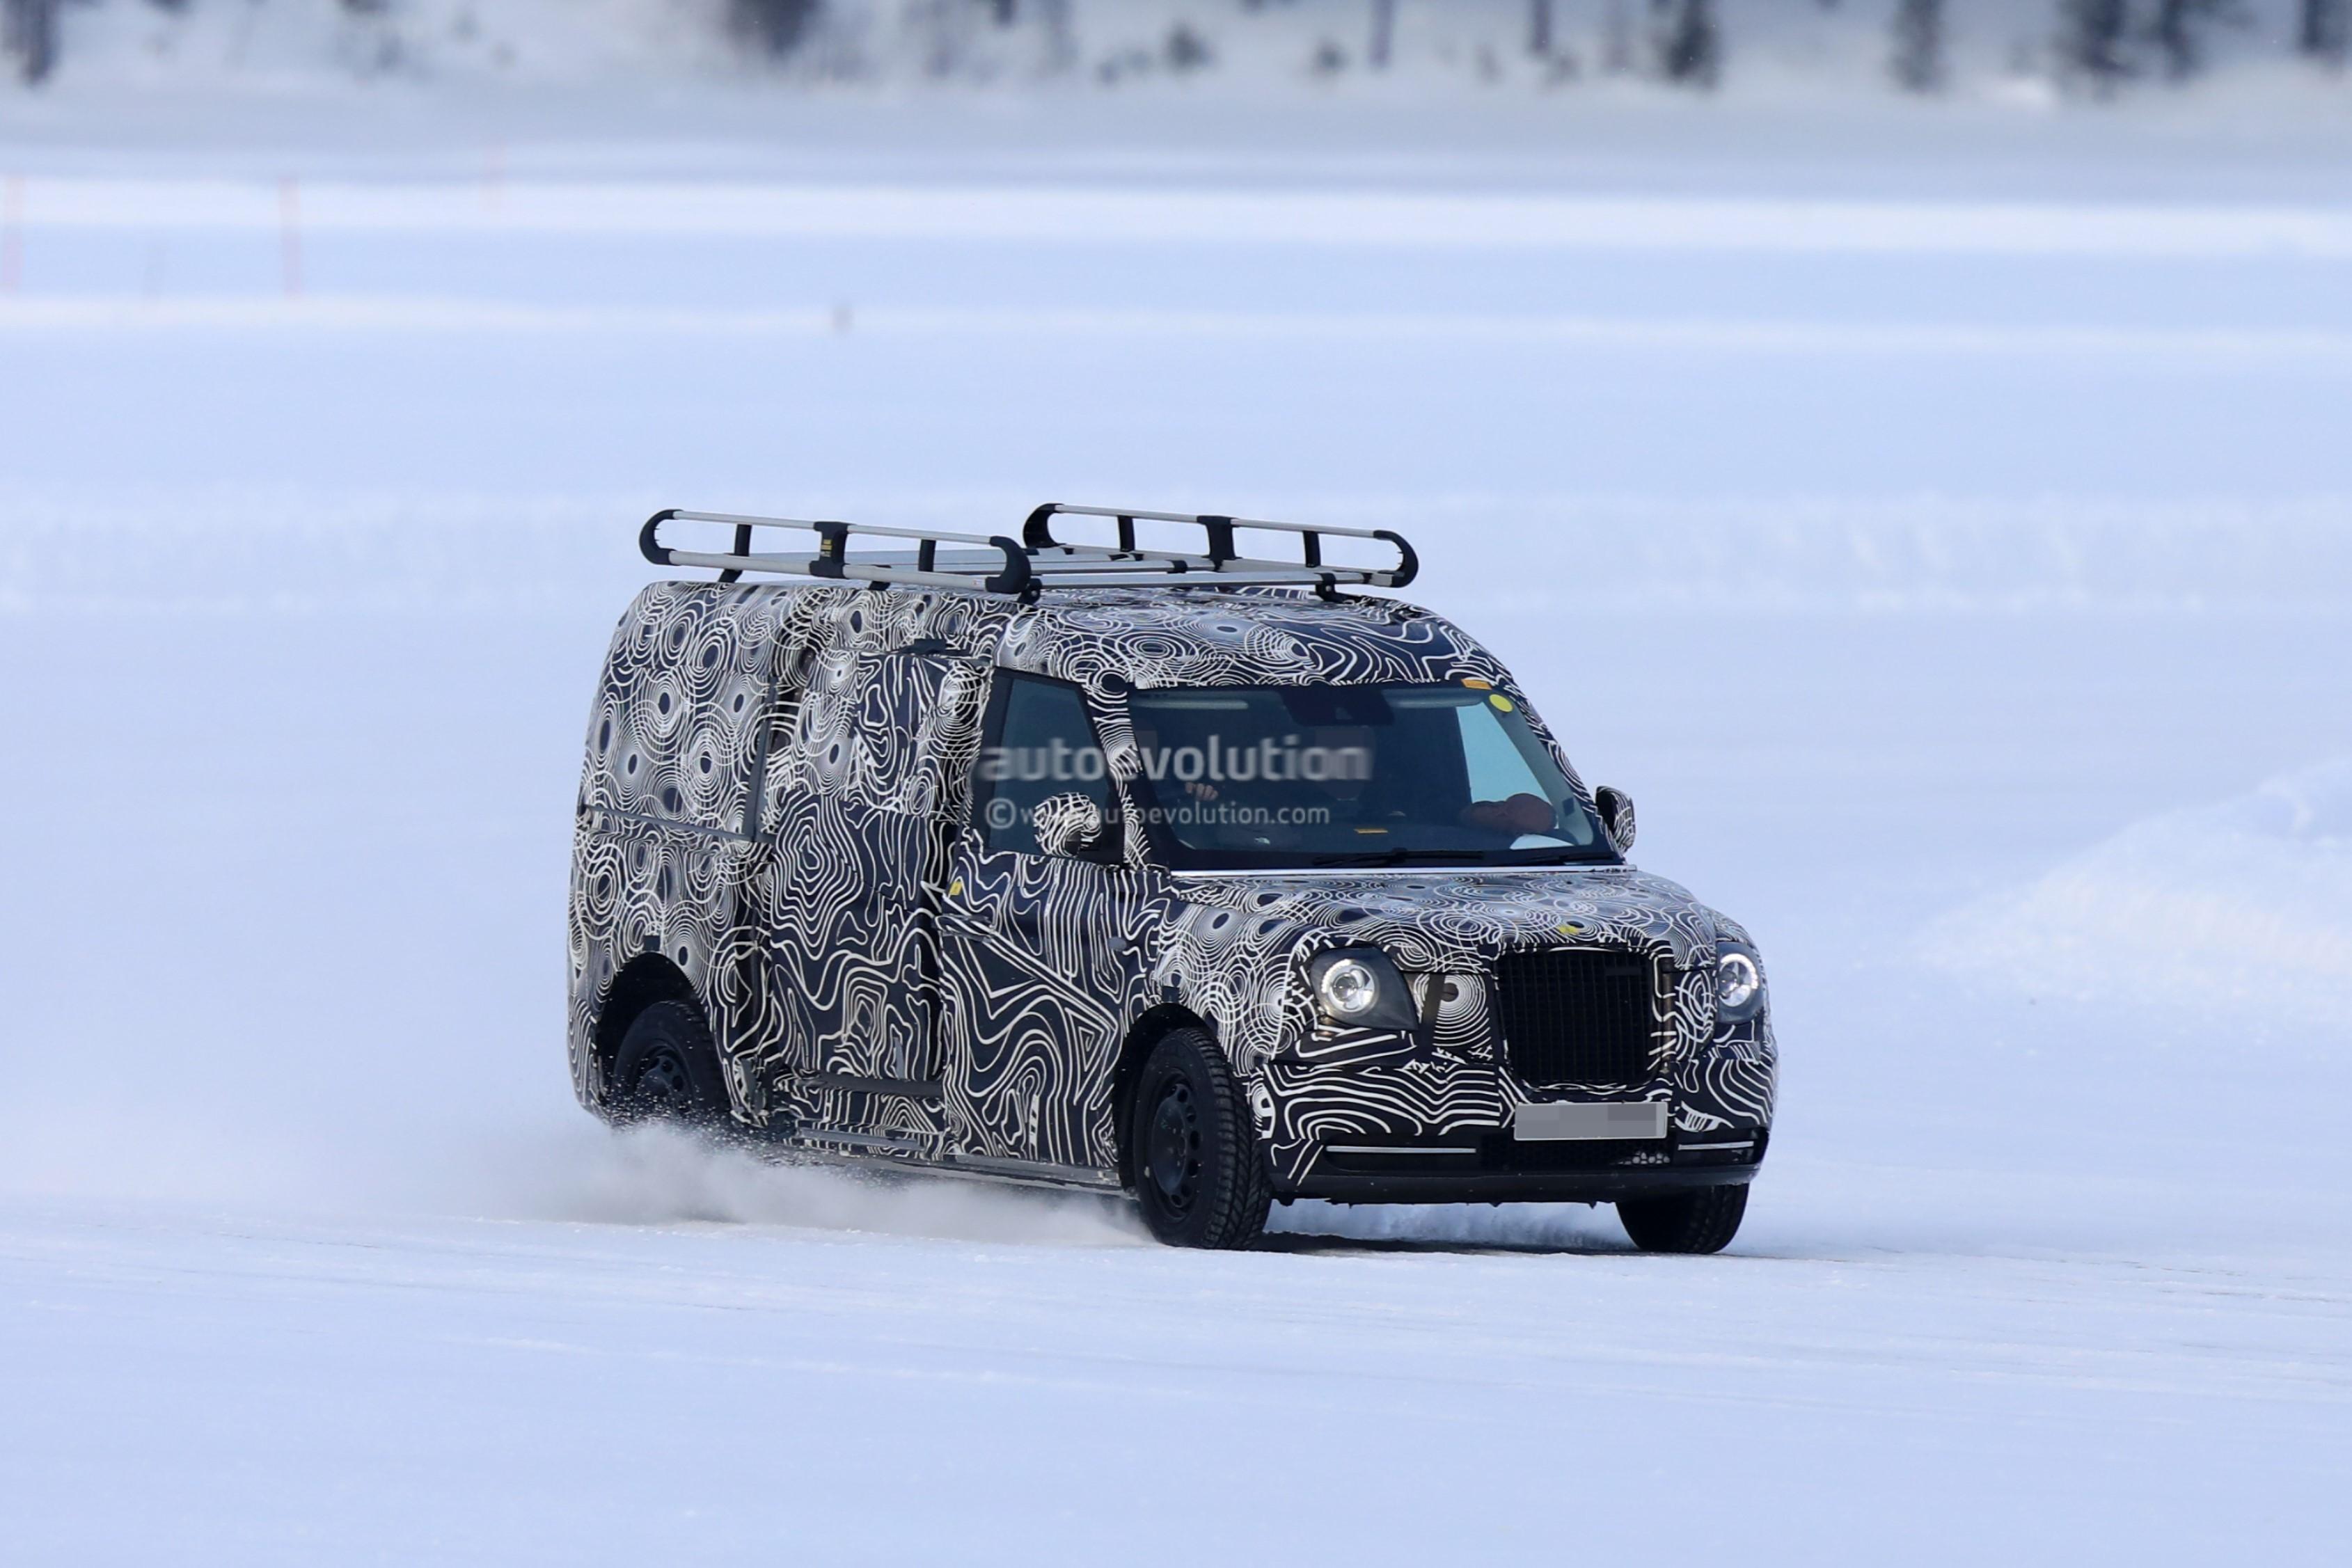 2019 LEVC Light Commercial Vehicle Looks Boxy - autoevolution